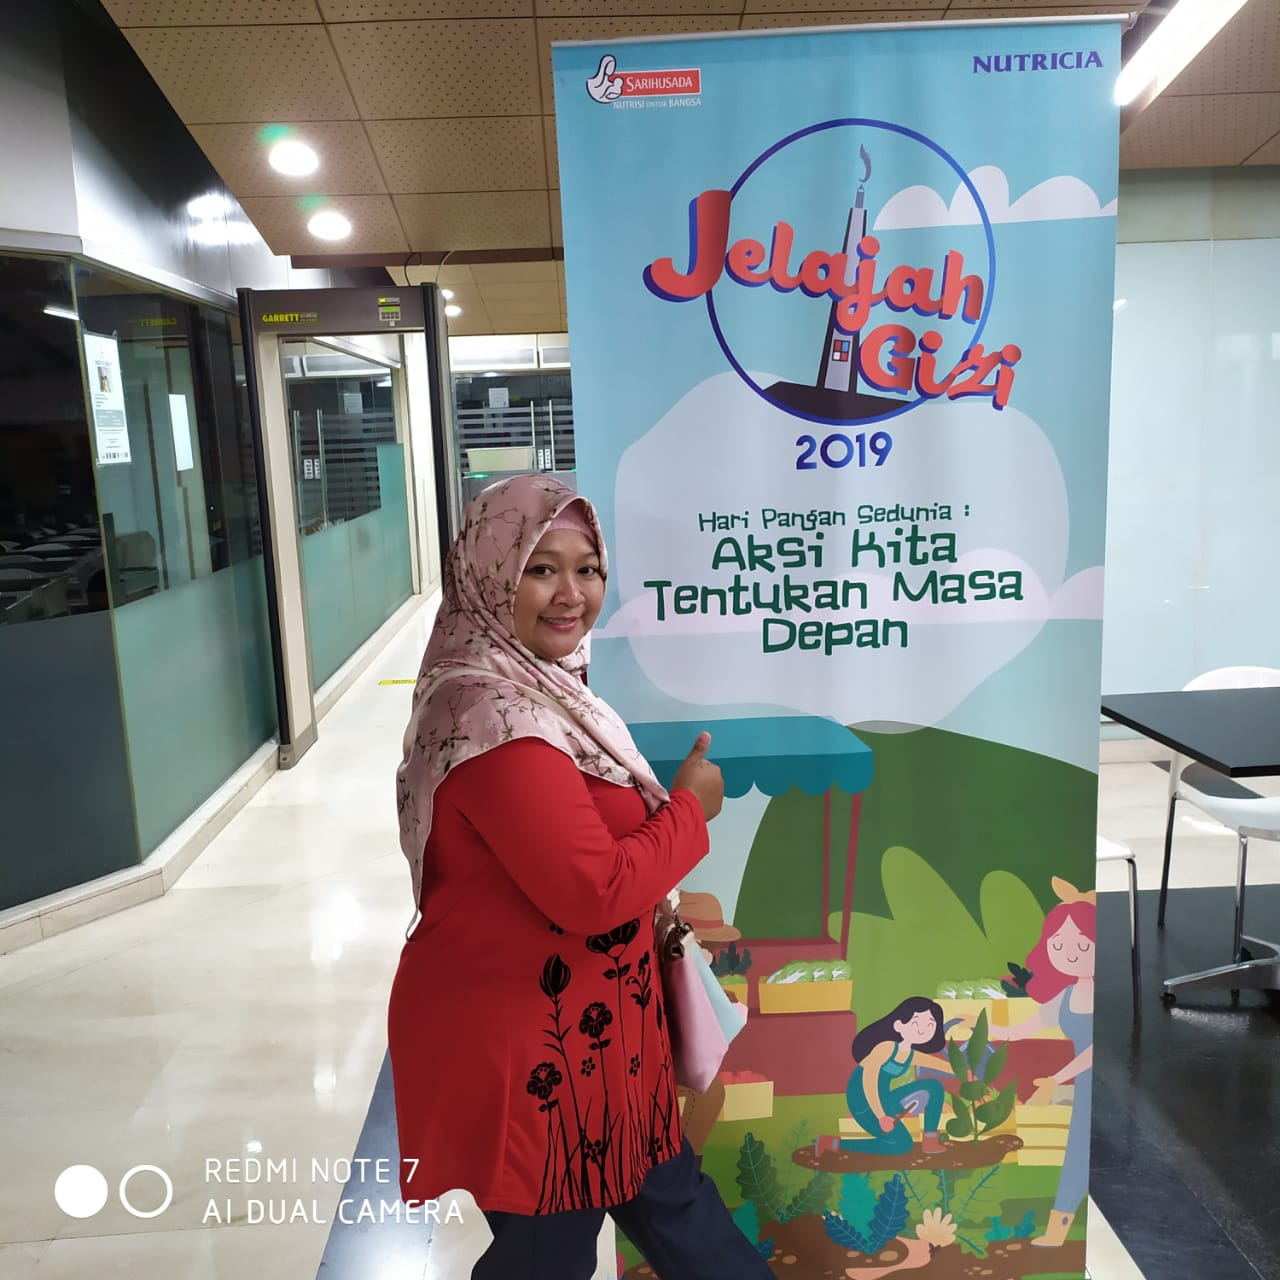 Jelajah gizi Bogor